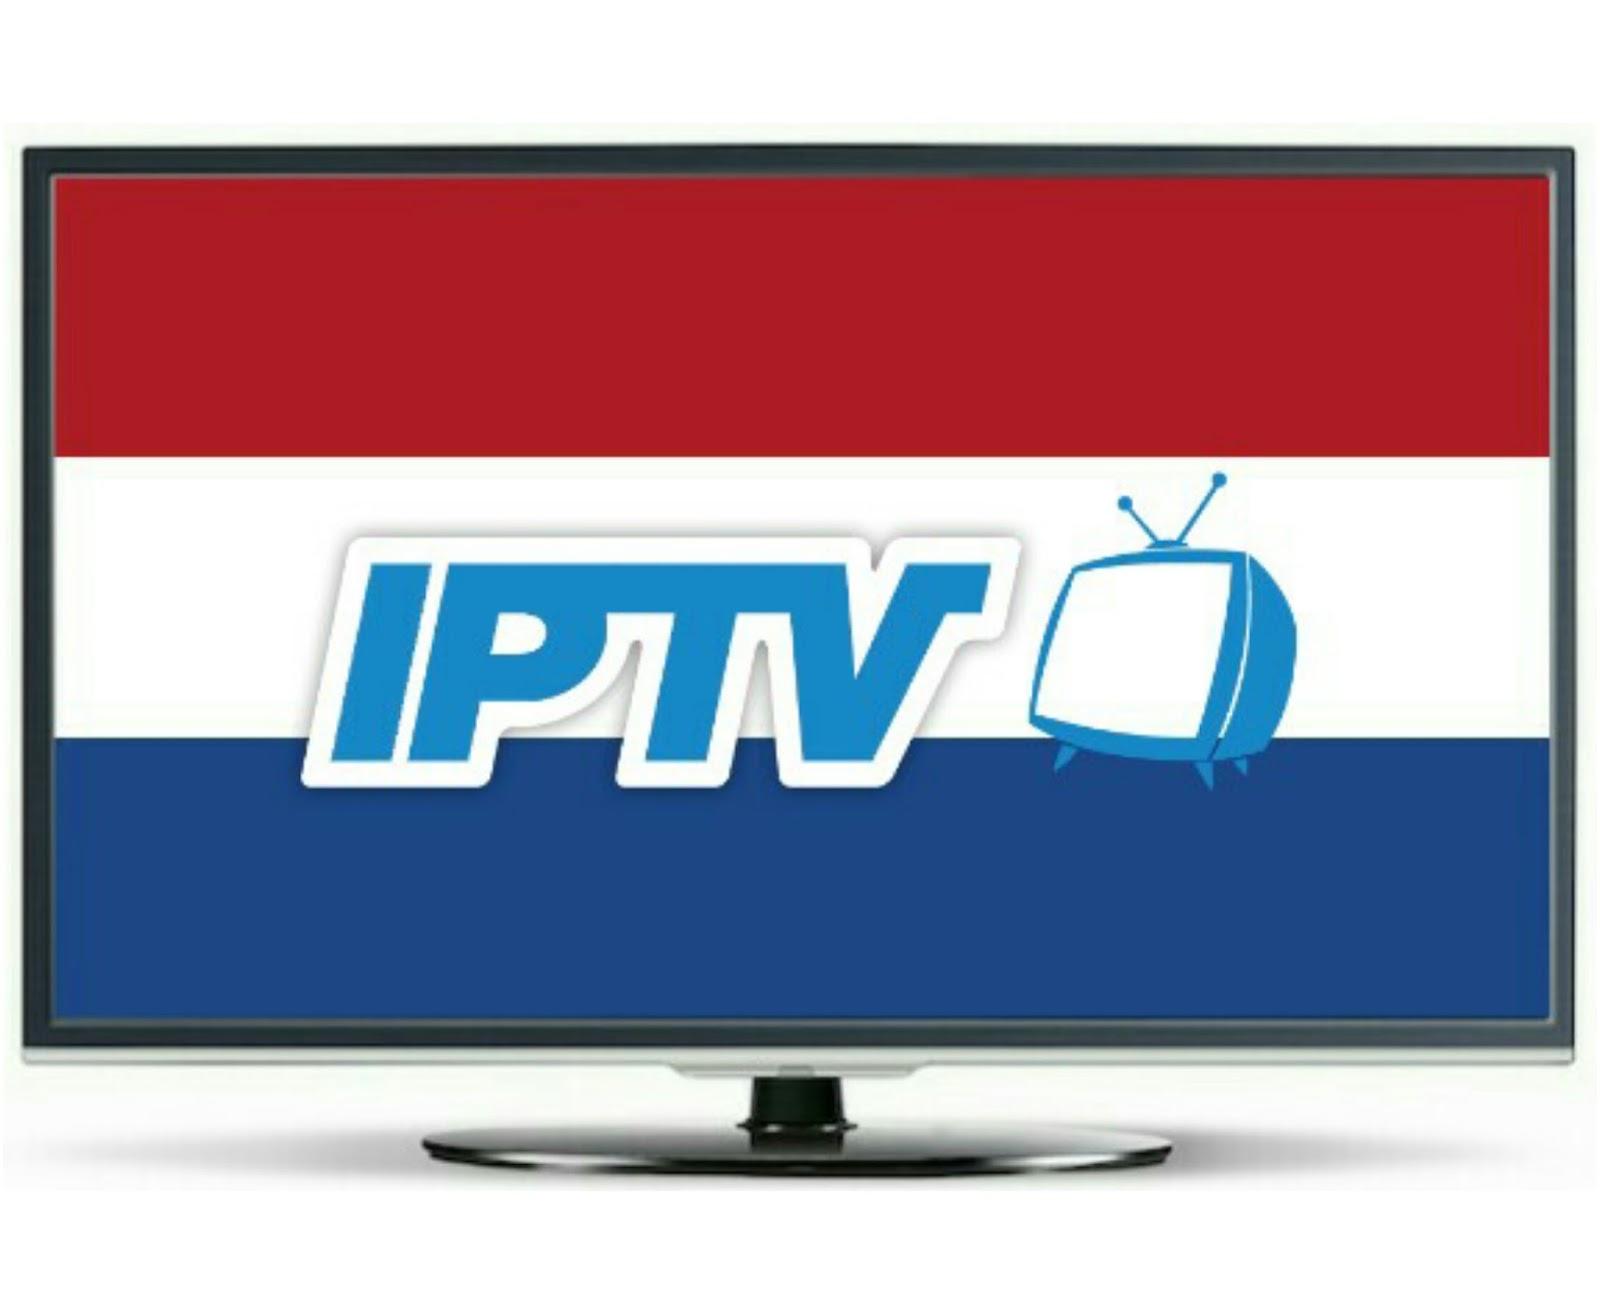 Full Iptv Netherland Free Iptv Free Download 21-10-2019